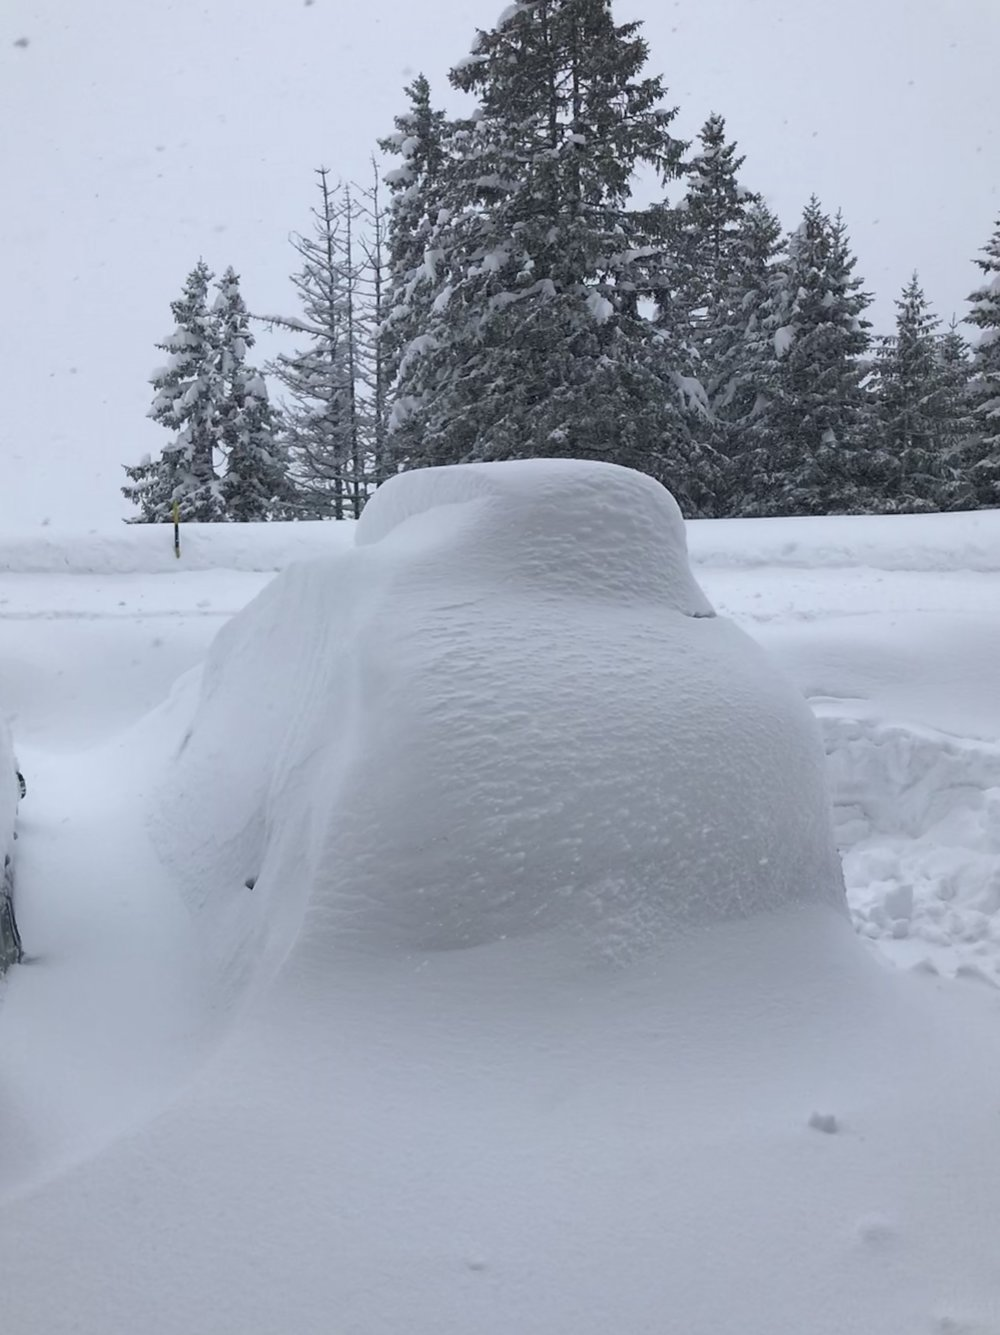 Schneefall vom Freitagabend bis Sonntagnachmittag (Foto ©Tom Pellny)